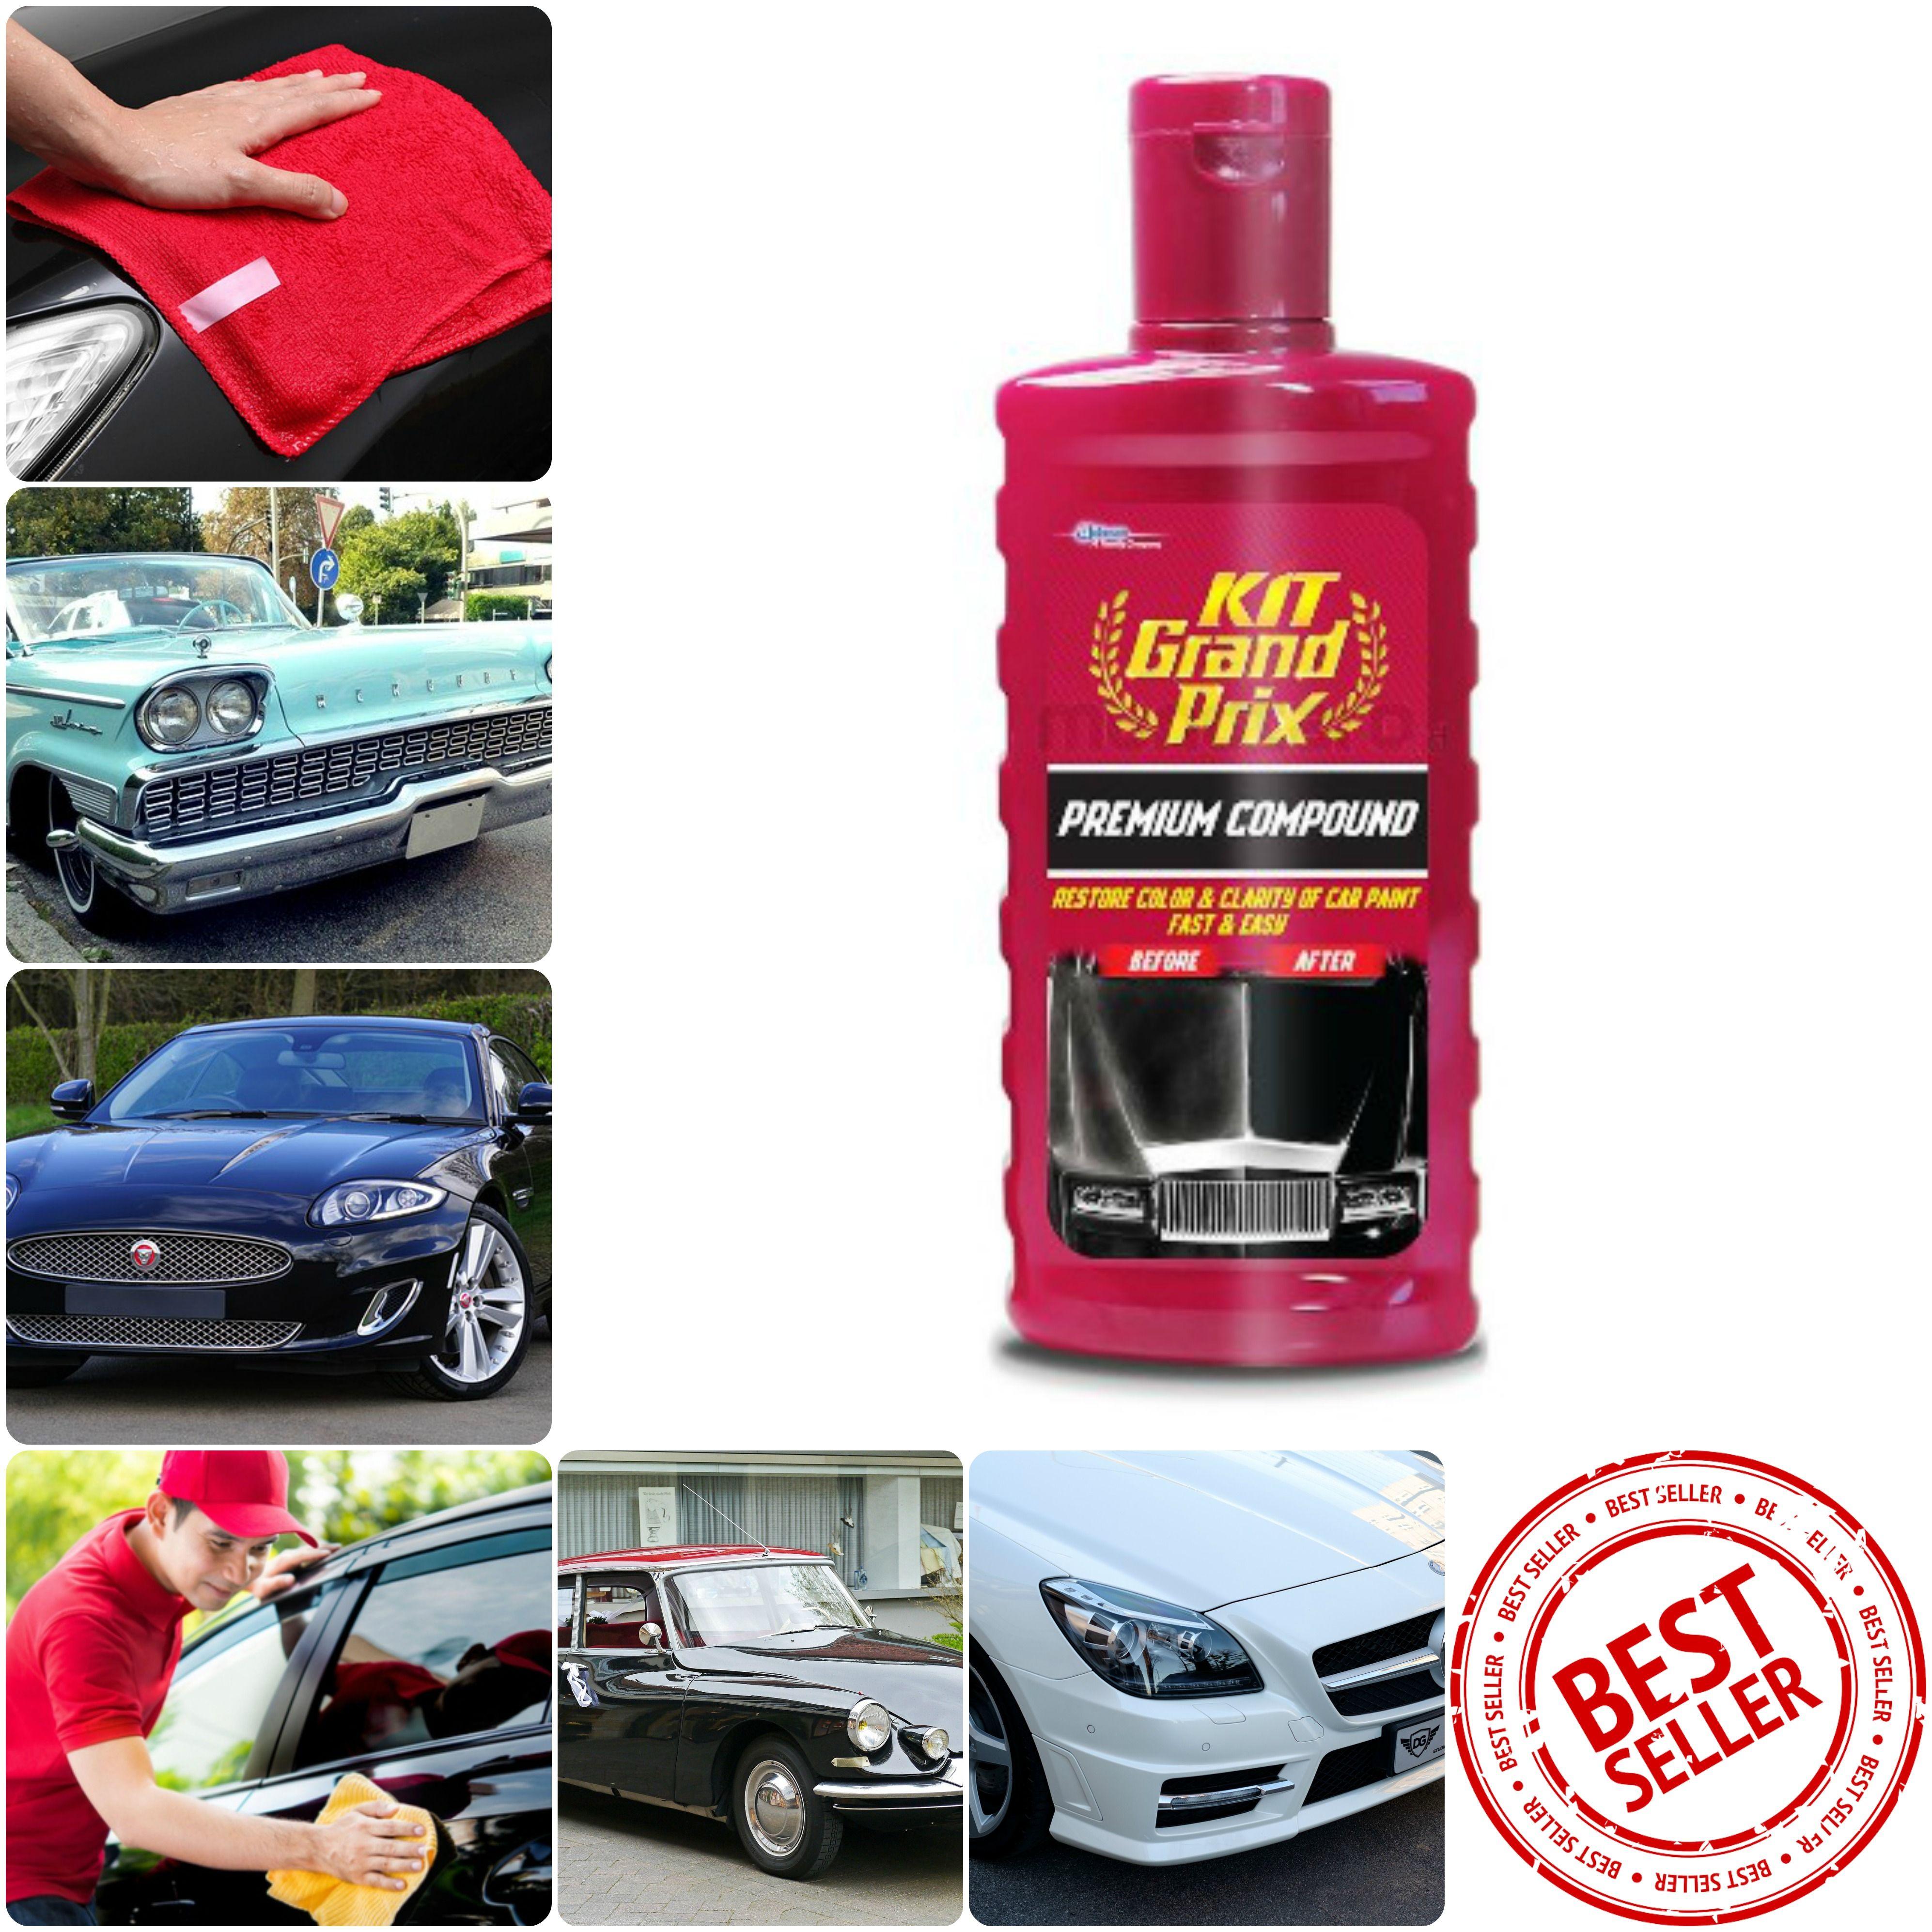 Pembersih Noda Pada Cat Mobil Kit Grand Prix Premium Compound 275ml Grand Prix Grands Noda